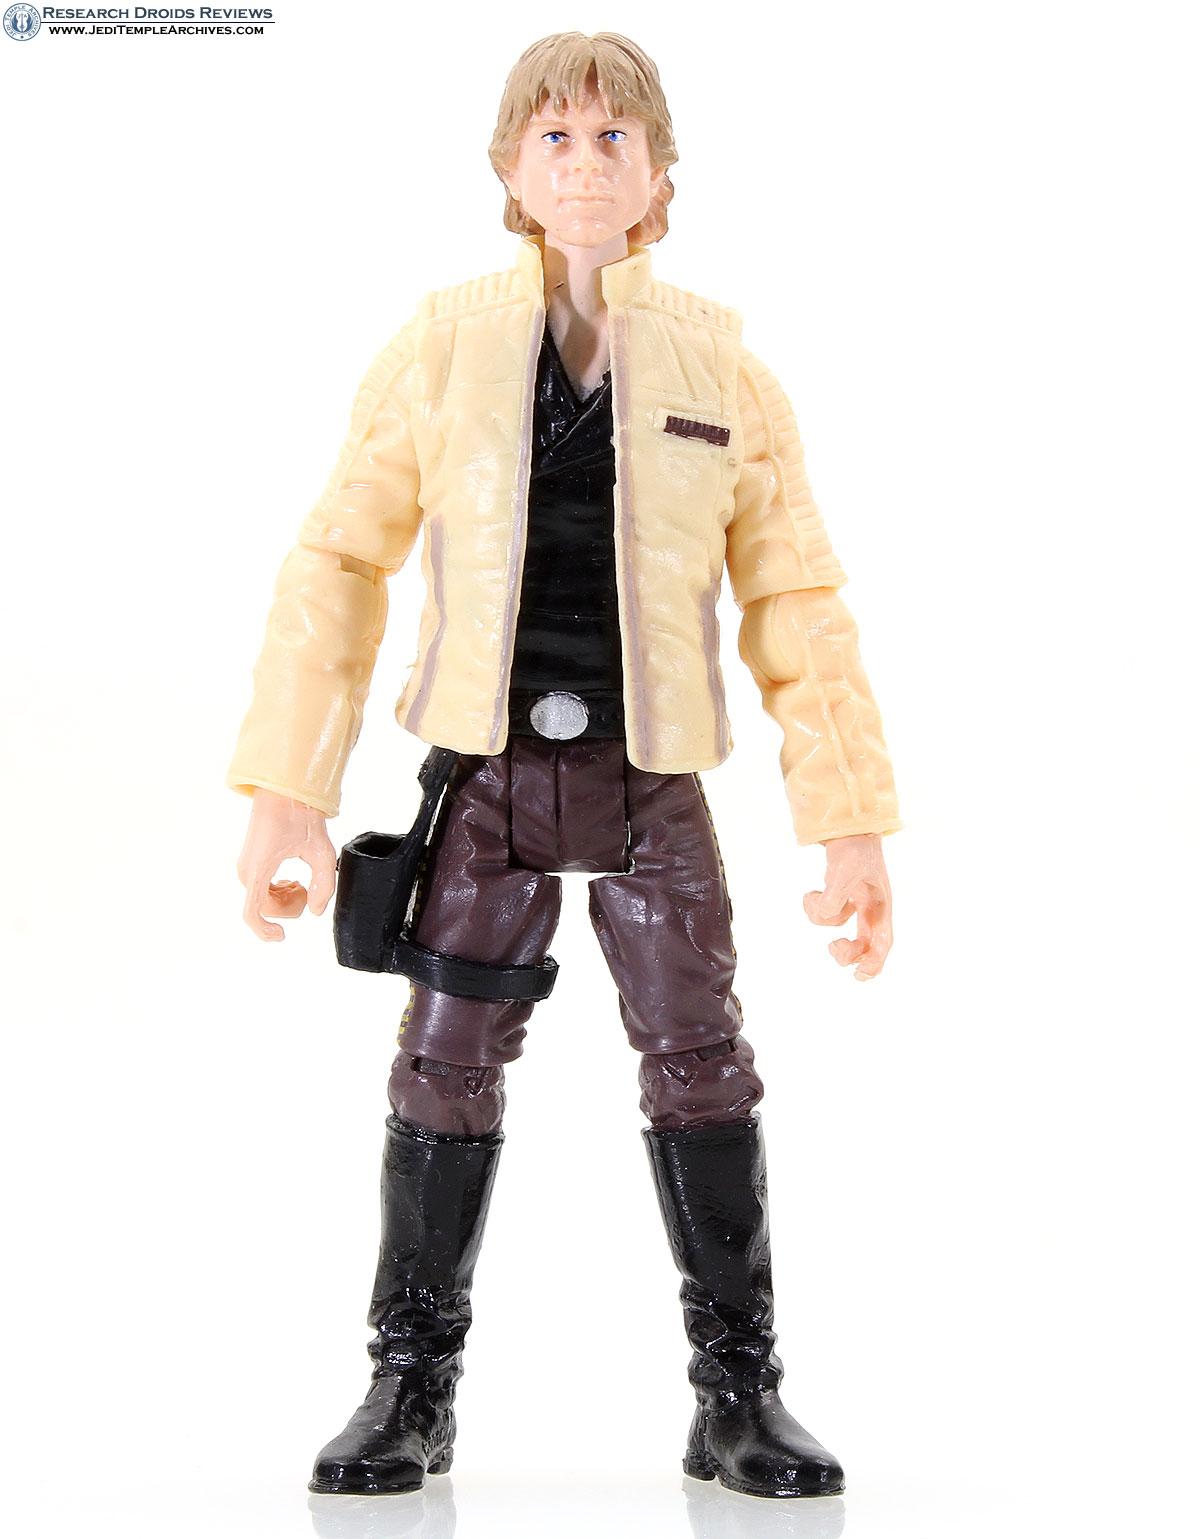 Luke Skywalker Ceremonial Outfit (TBS 13 second version longer strap)